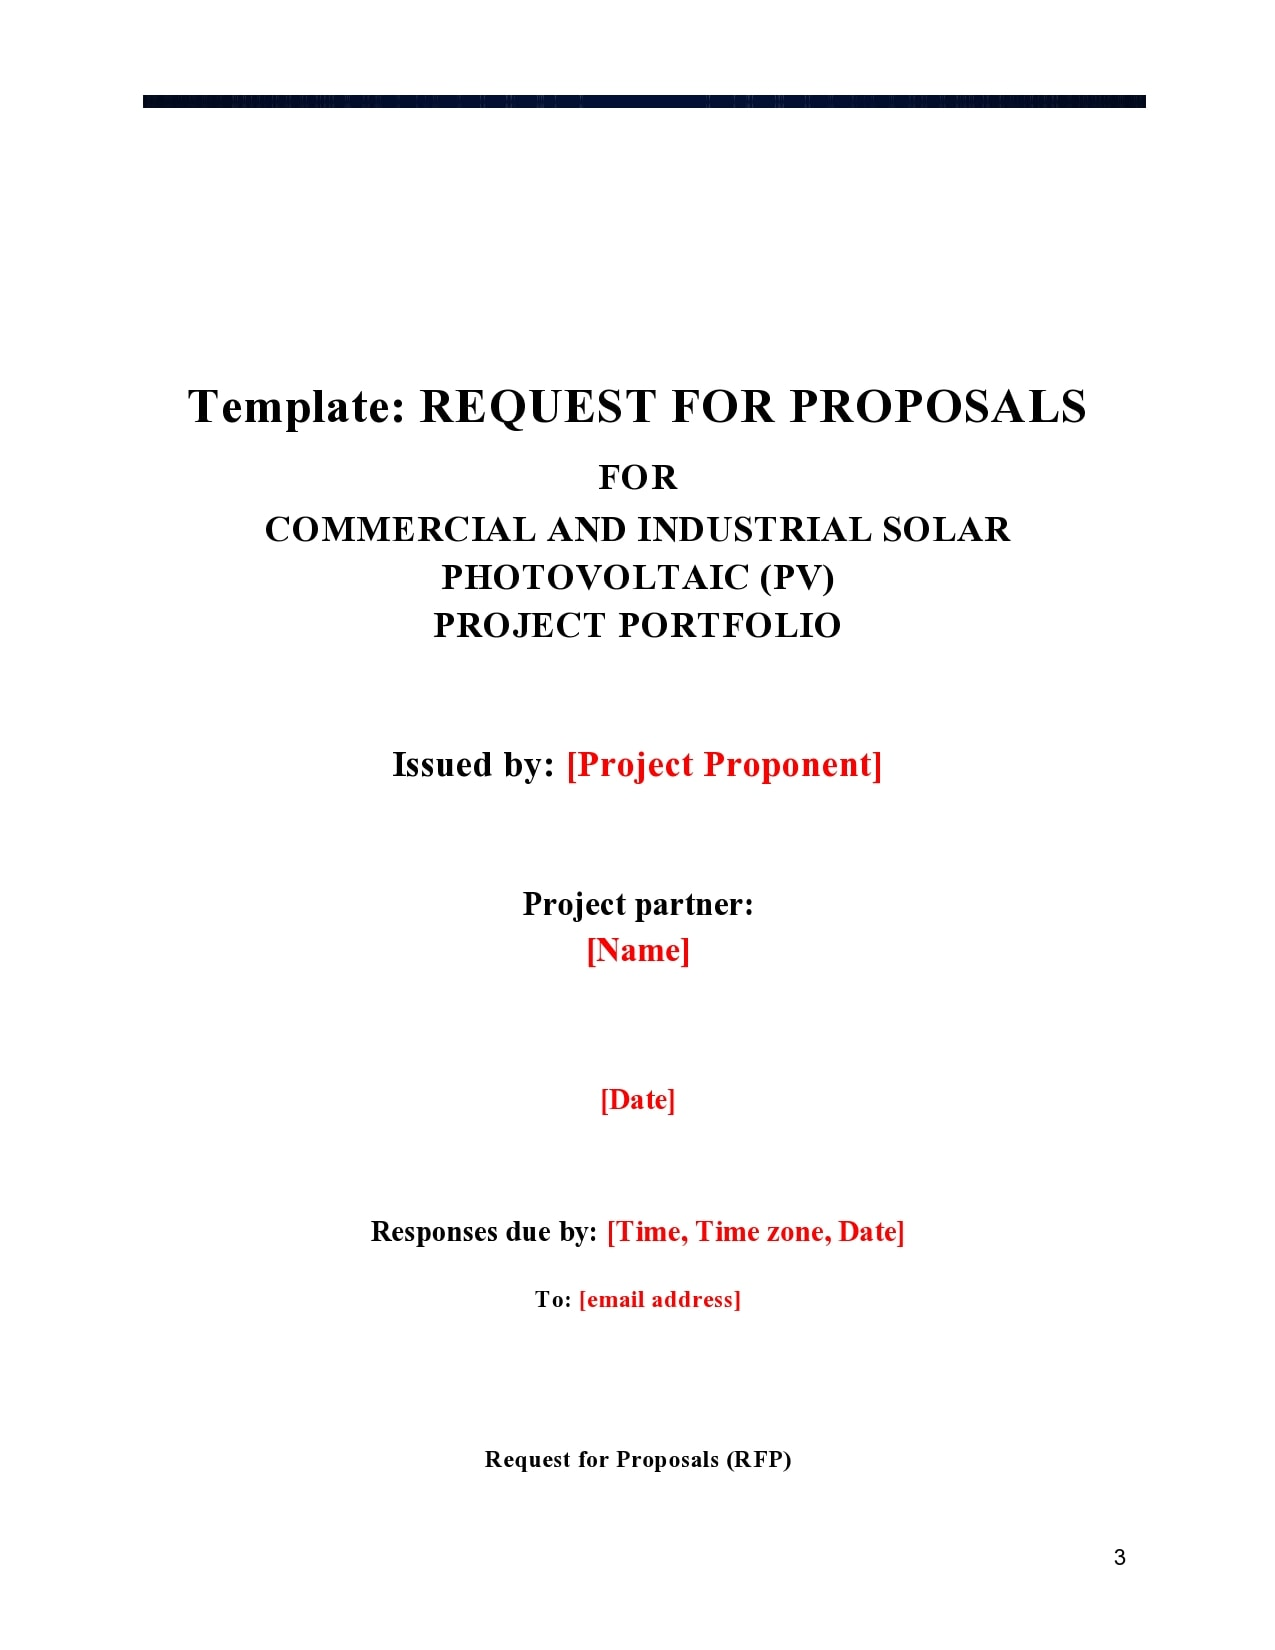 rfp template 07